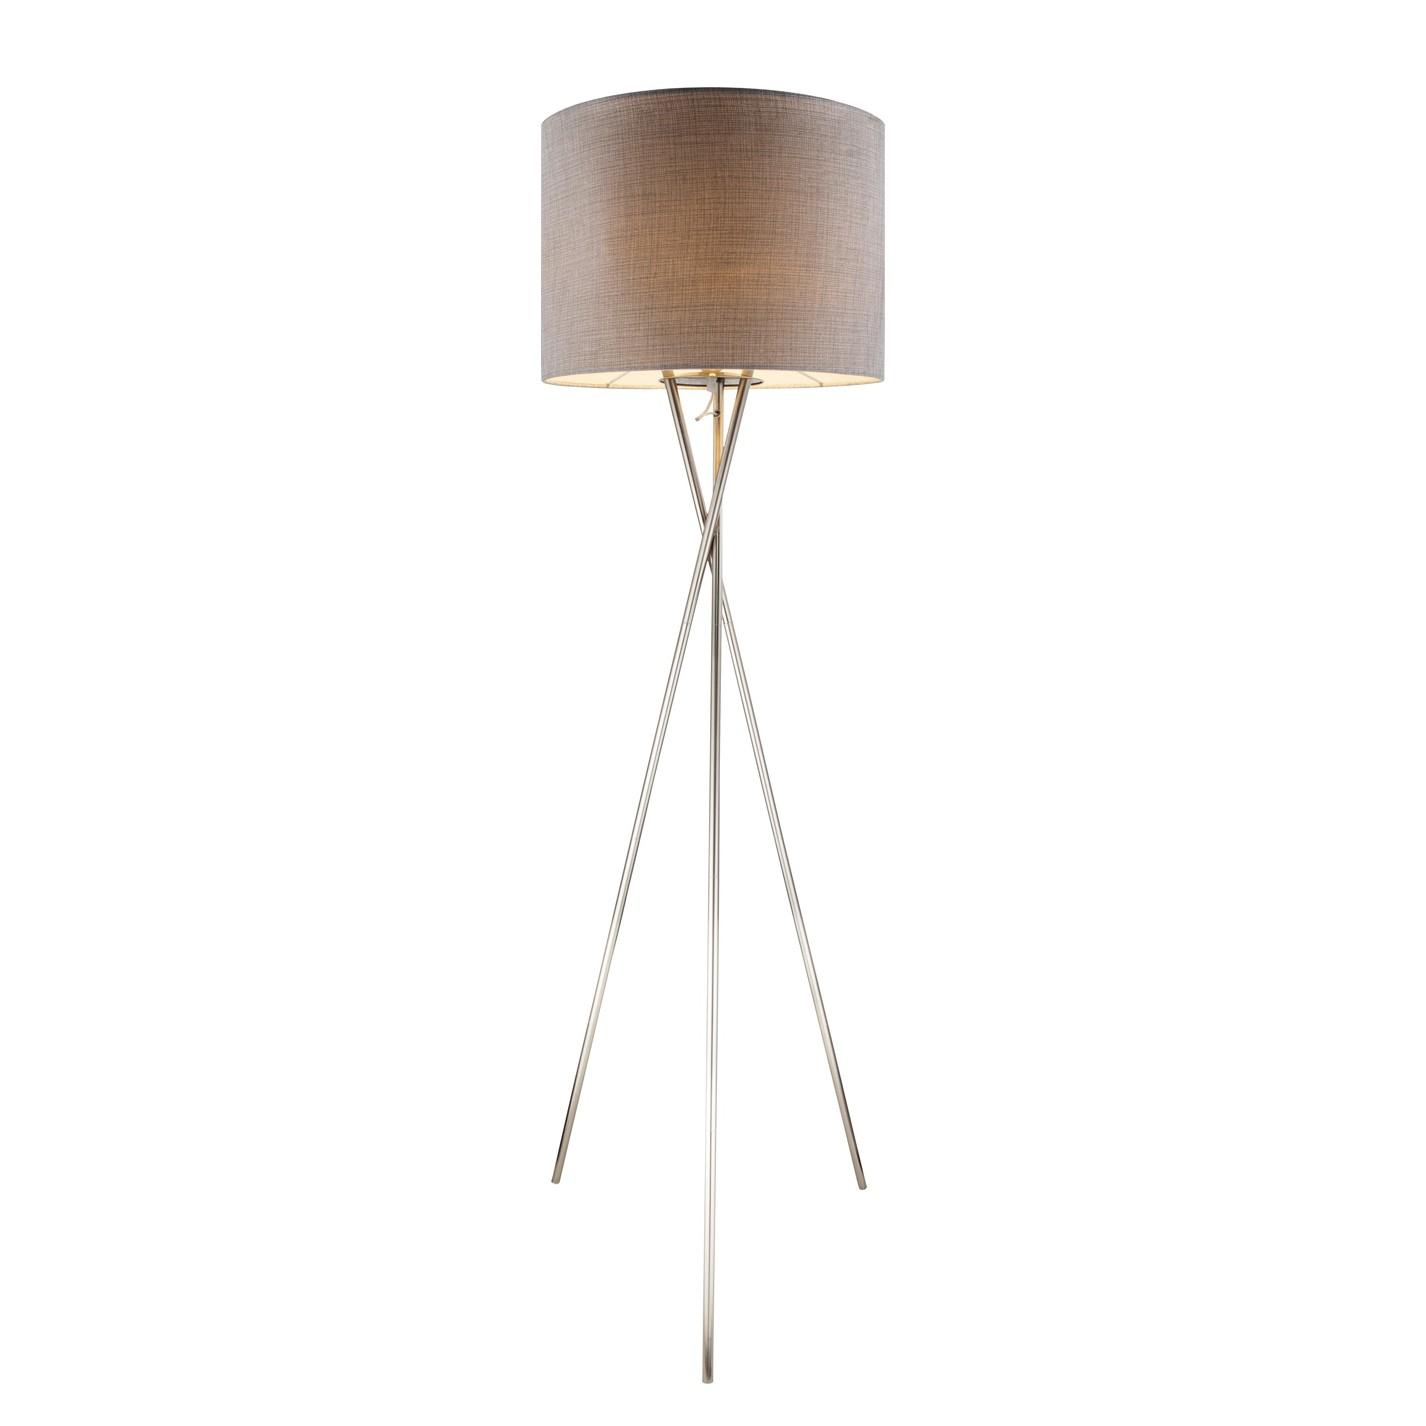 EEK A++, Lampadaire Paco II - Tissu / Métal - 1 ampoule, Globo Lighting